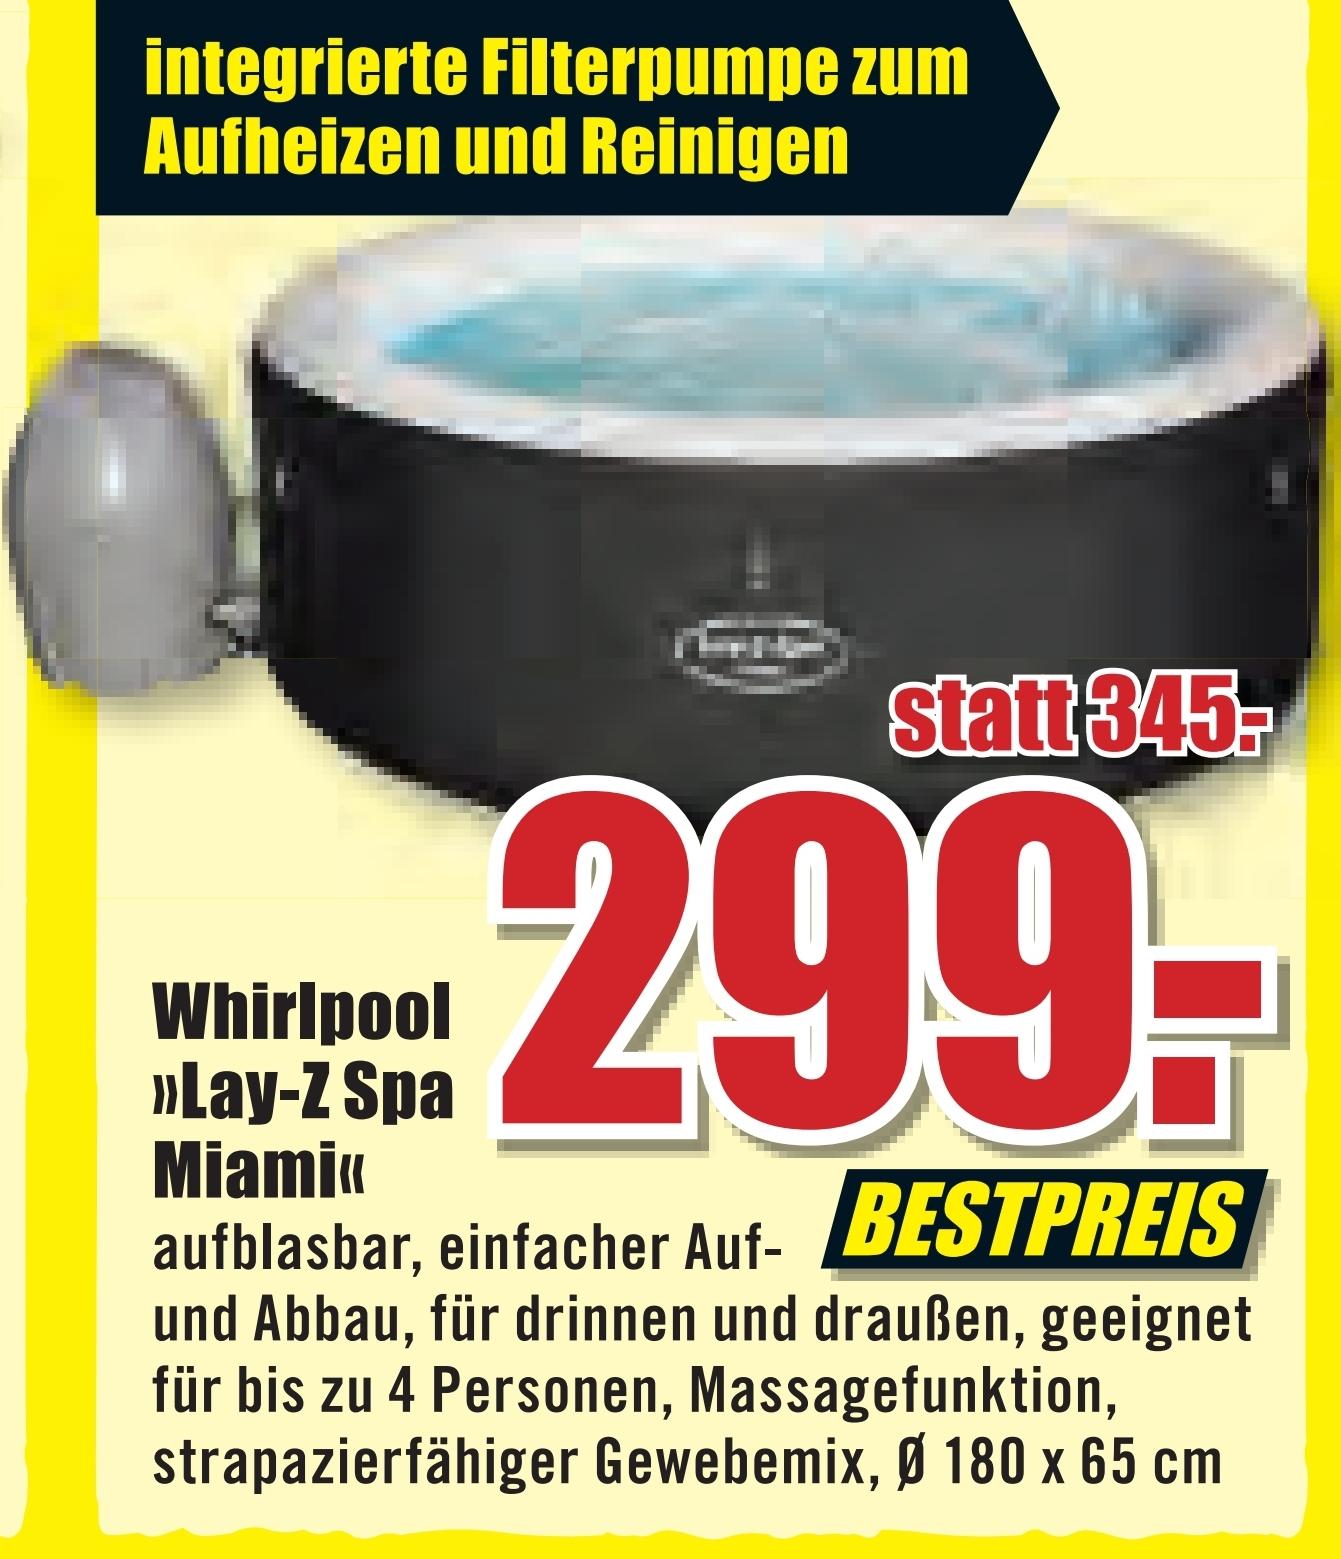 "[B1 Baumarkt] Whirlpool ""Lay-Z Spa Miami"" zum Bestpreis"